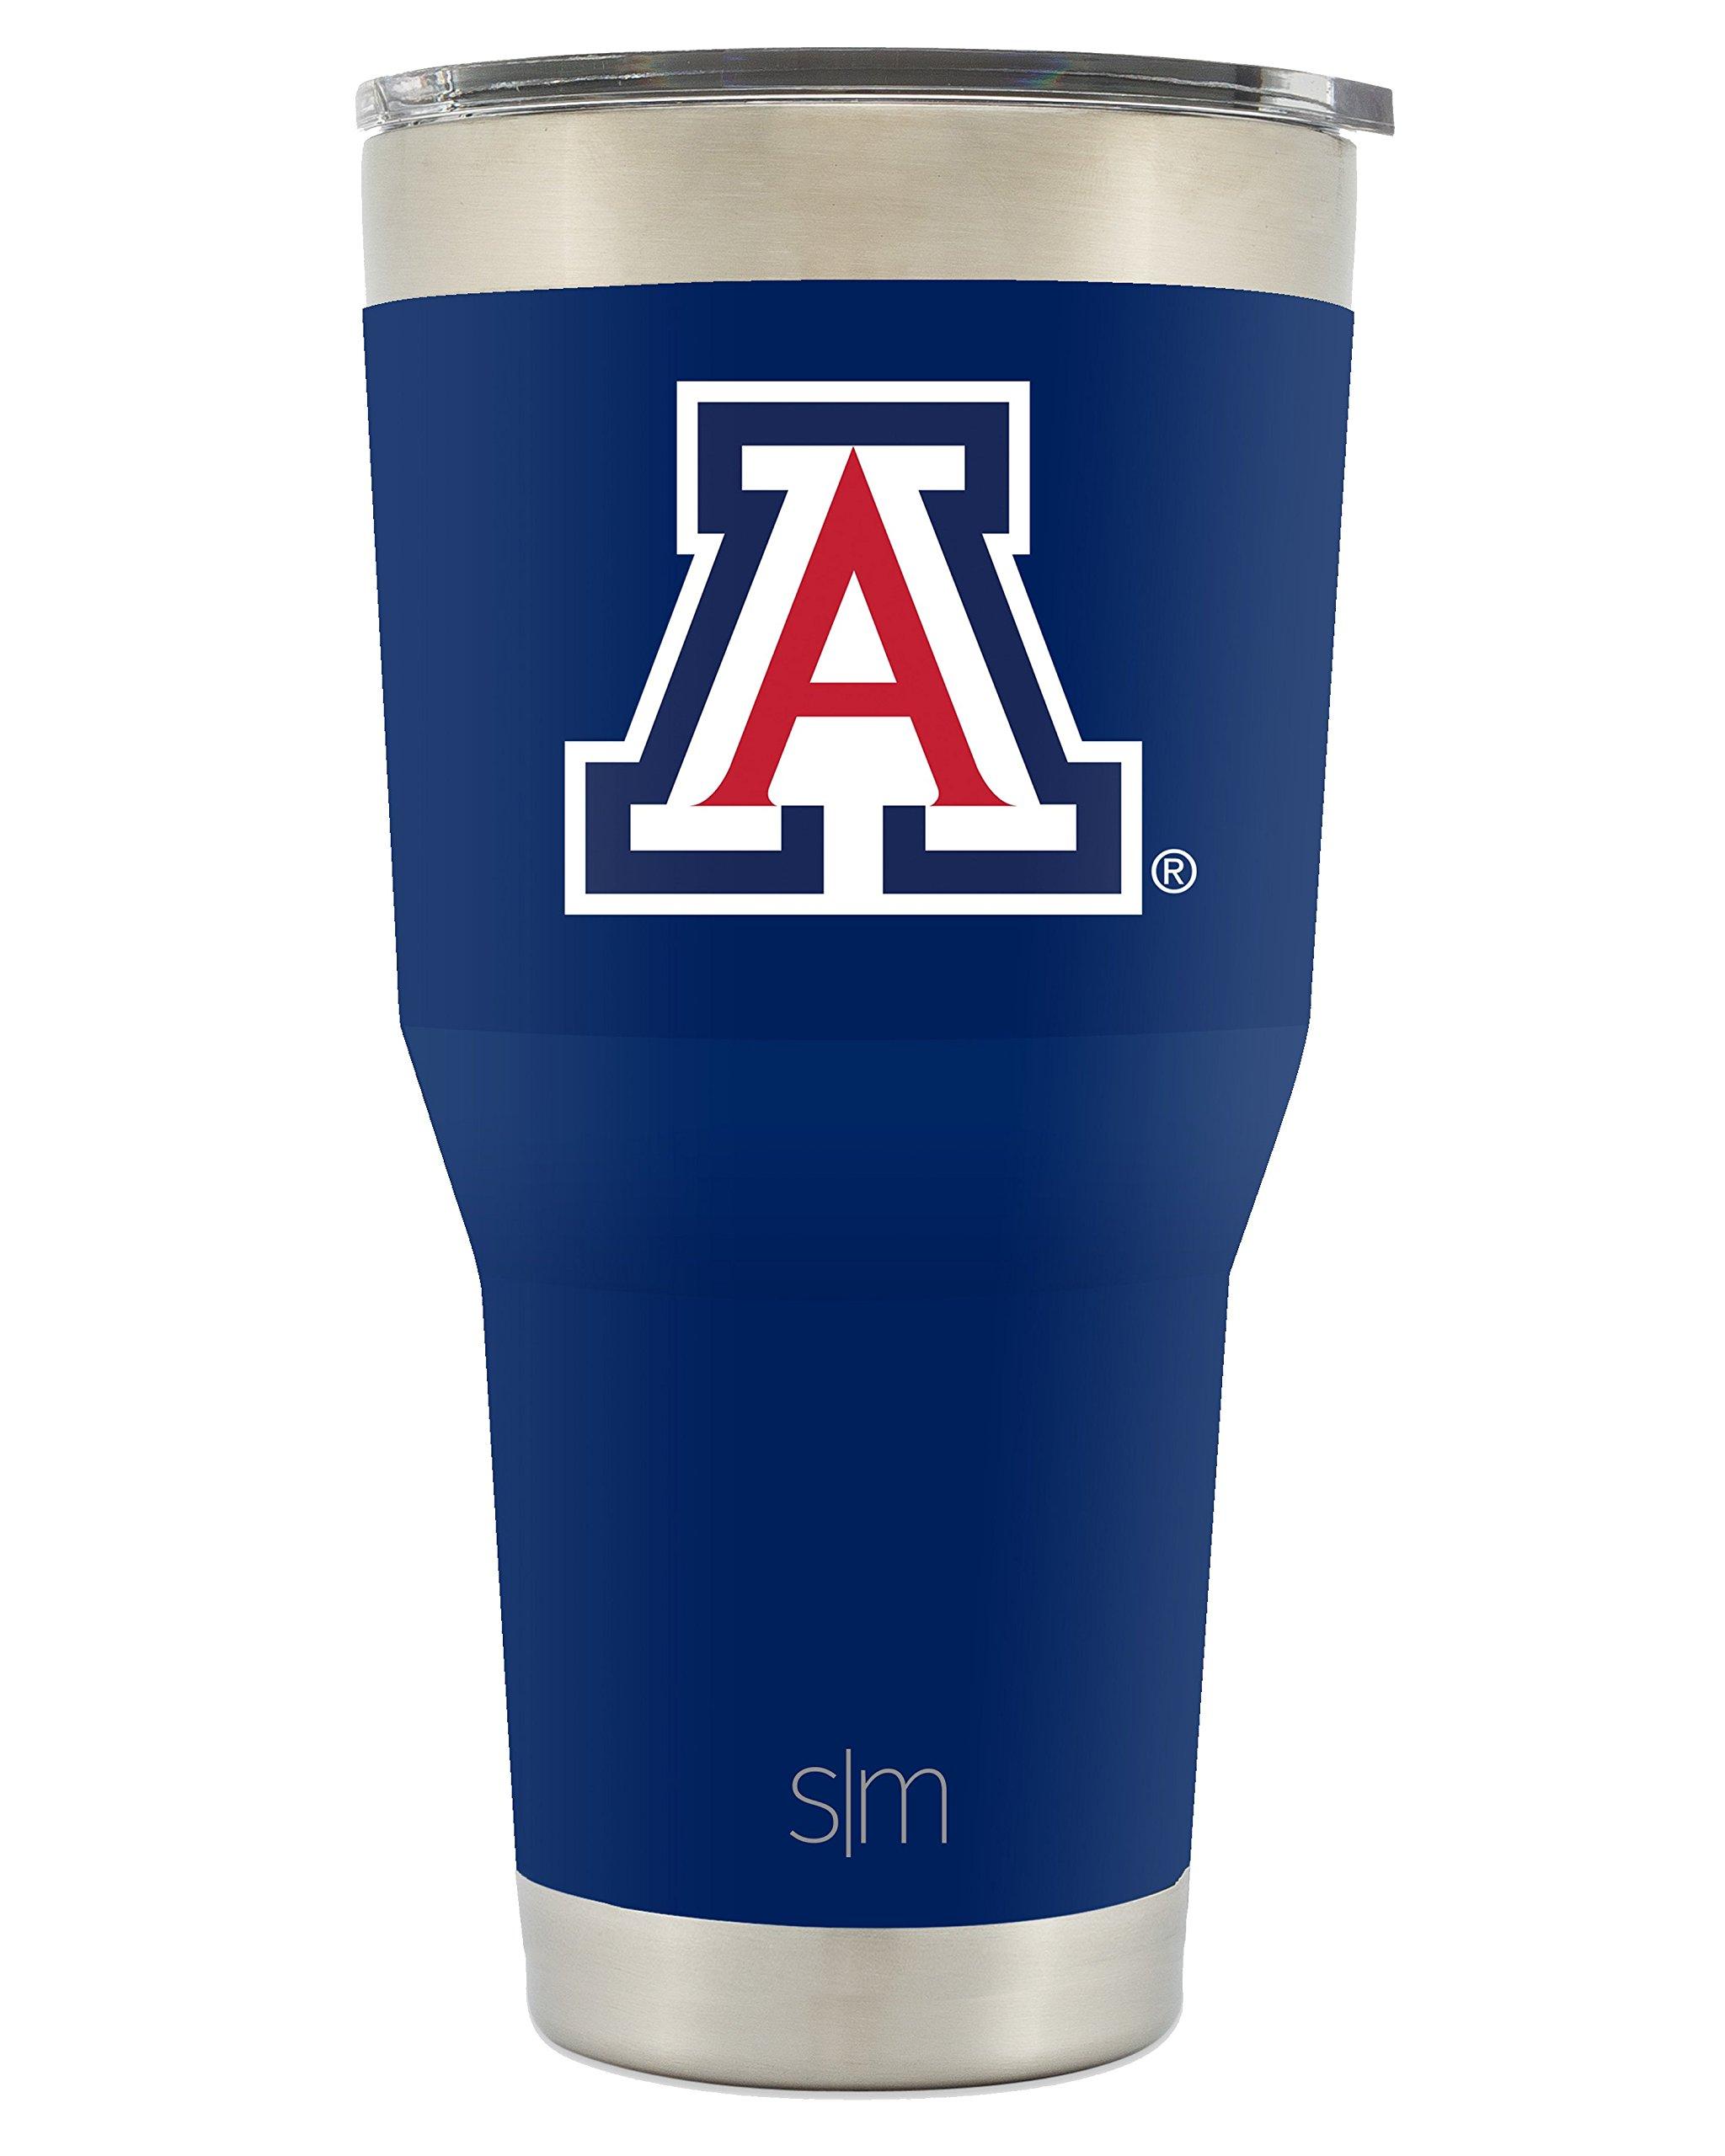 Simple Modern University of Arizona 30oz Cruiser Tumbler - Vacuum Insulated Stainless Steel Travel Mug - UA Wildcats Bear Down Tailgating Cup College Flask